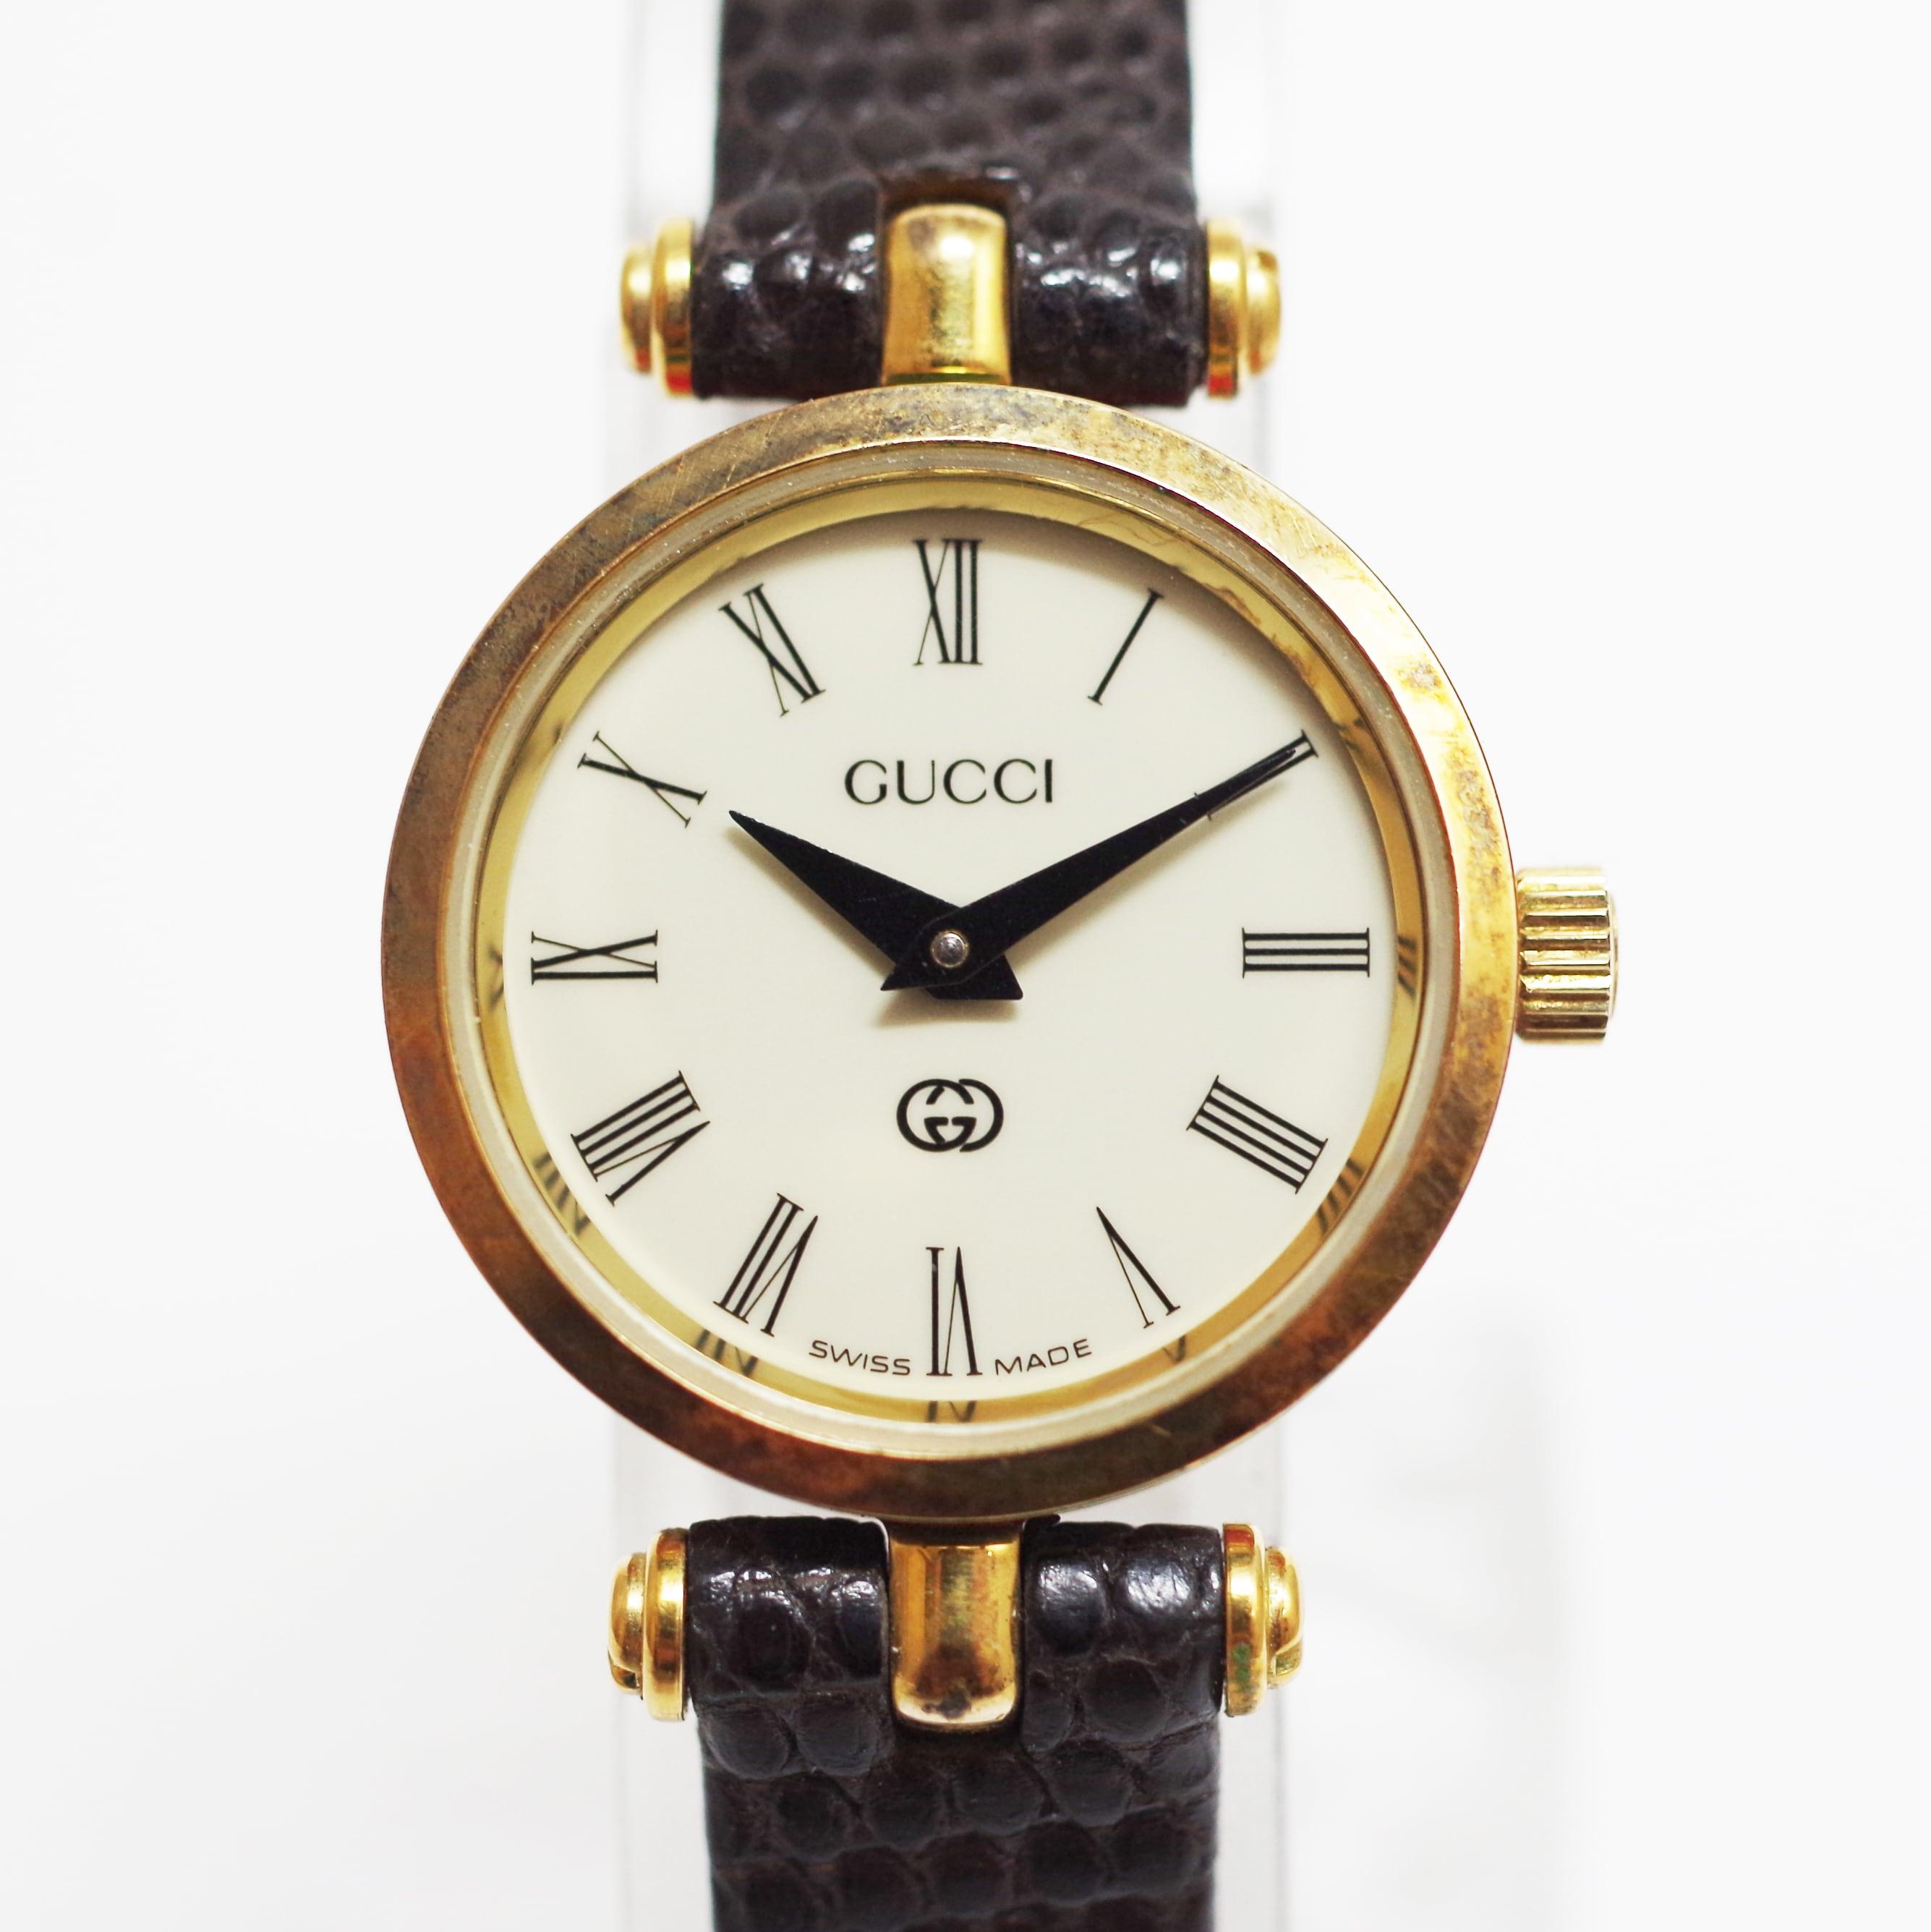 GUCCI グッチ シェリーライン クオーツ ホワイト文字盤 レディース 腕時計